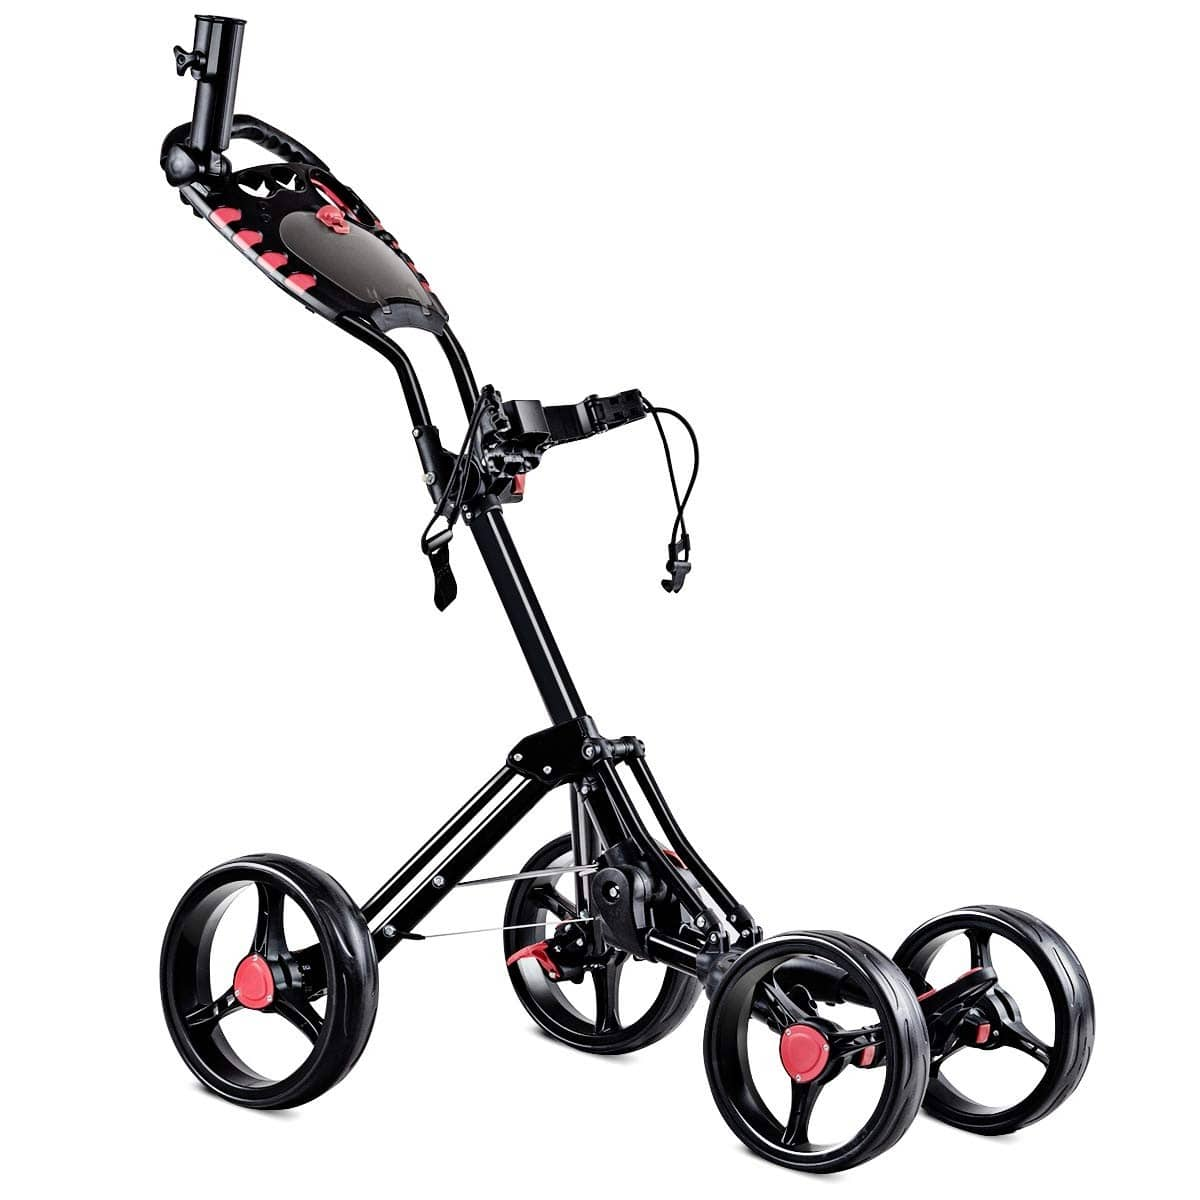 Folding 4 Wheels Golf Pull Push Cart Trolley - $115.95 + Free Shipping